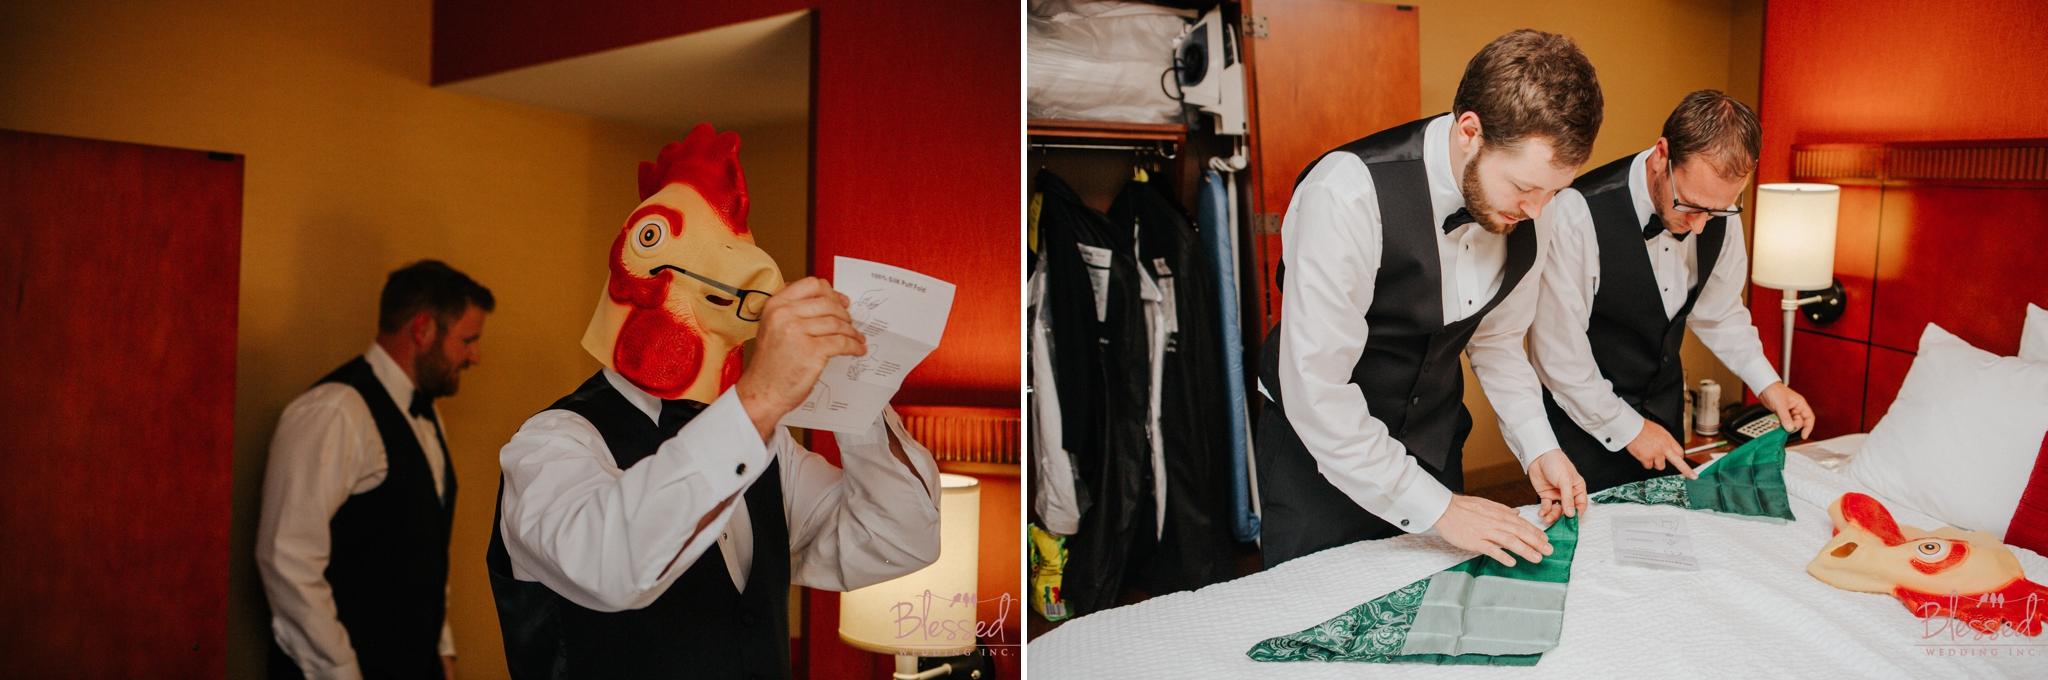 Orfila Vinery Wedding by Blessed Wedding Photography 14.jpg